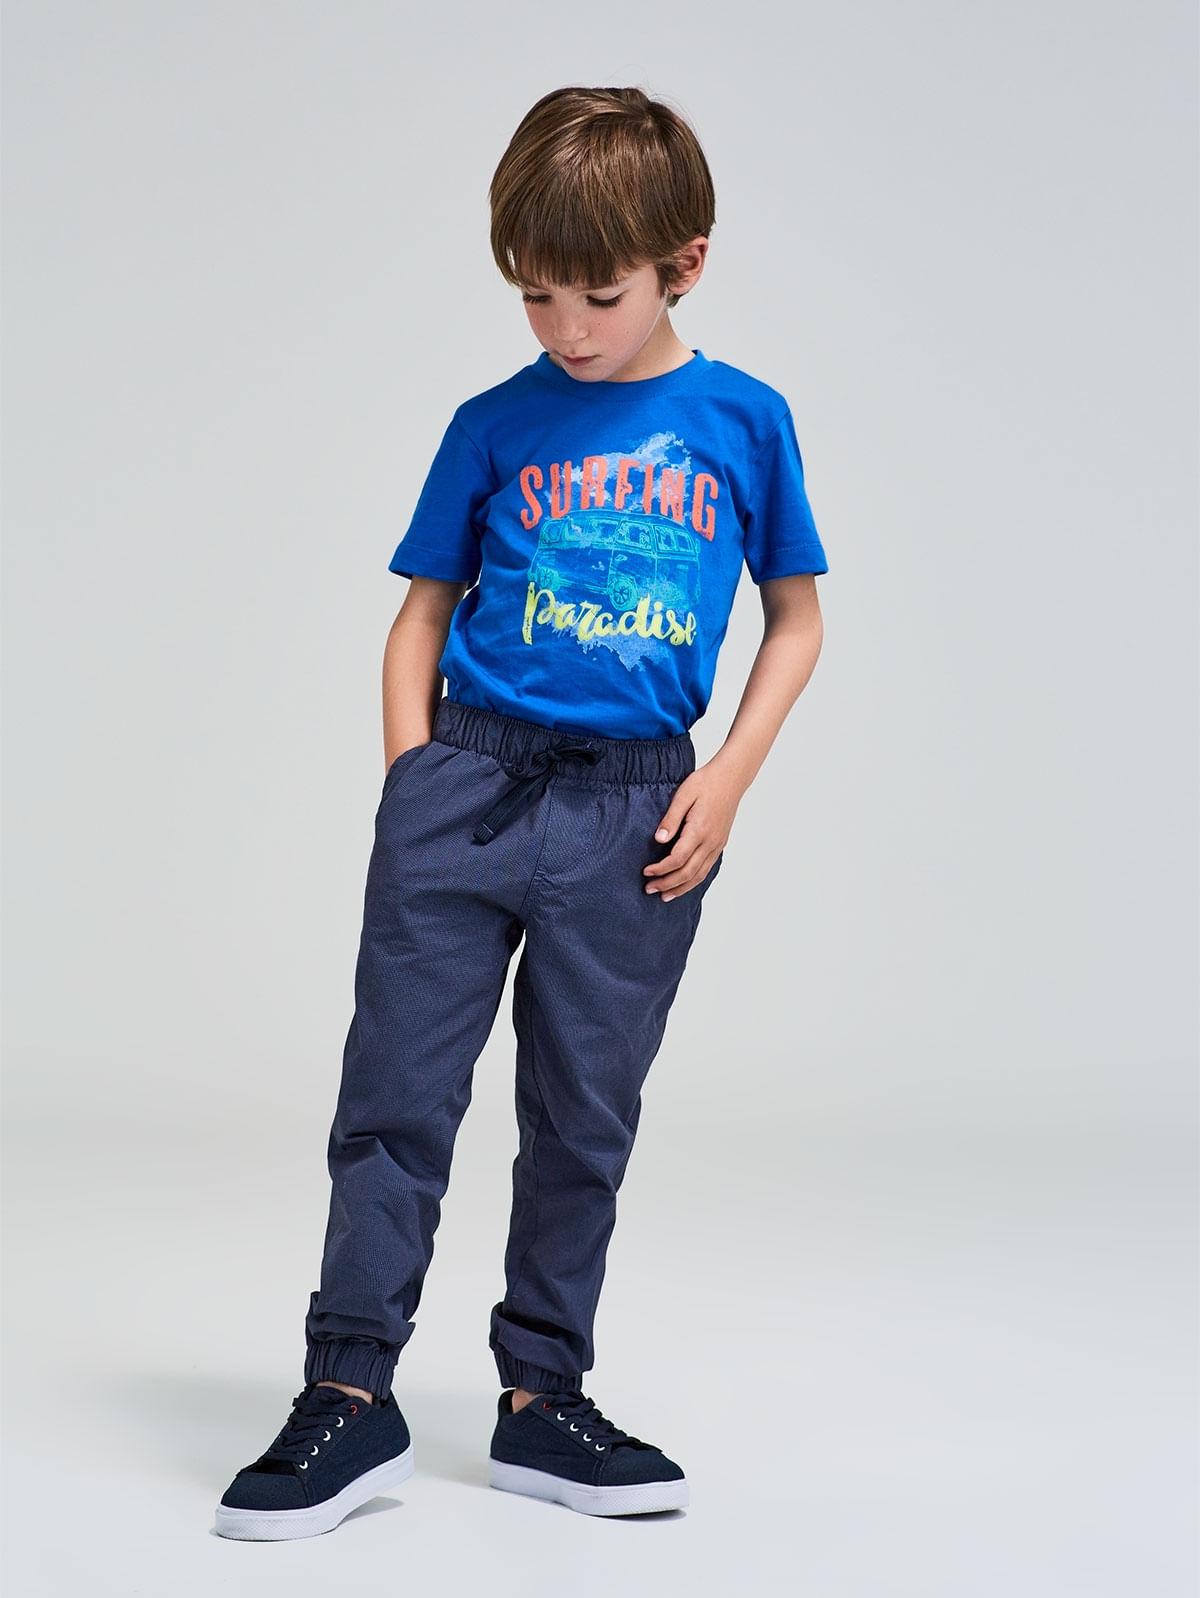 f1fece9906d89 Camiseta Básica Estampada para Niño 06363 - Arturo Calle